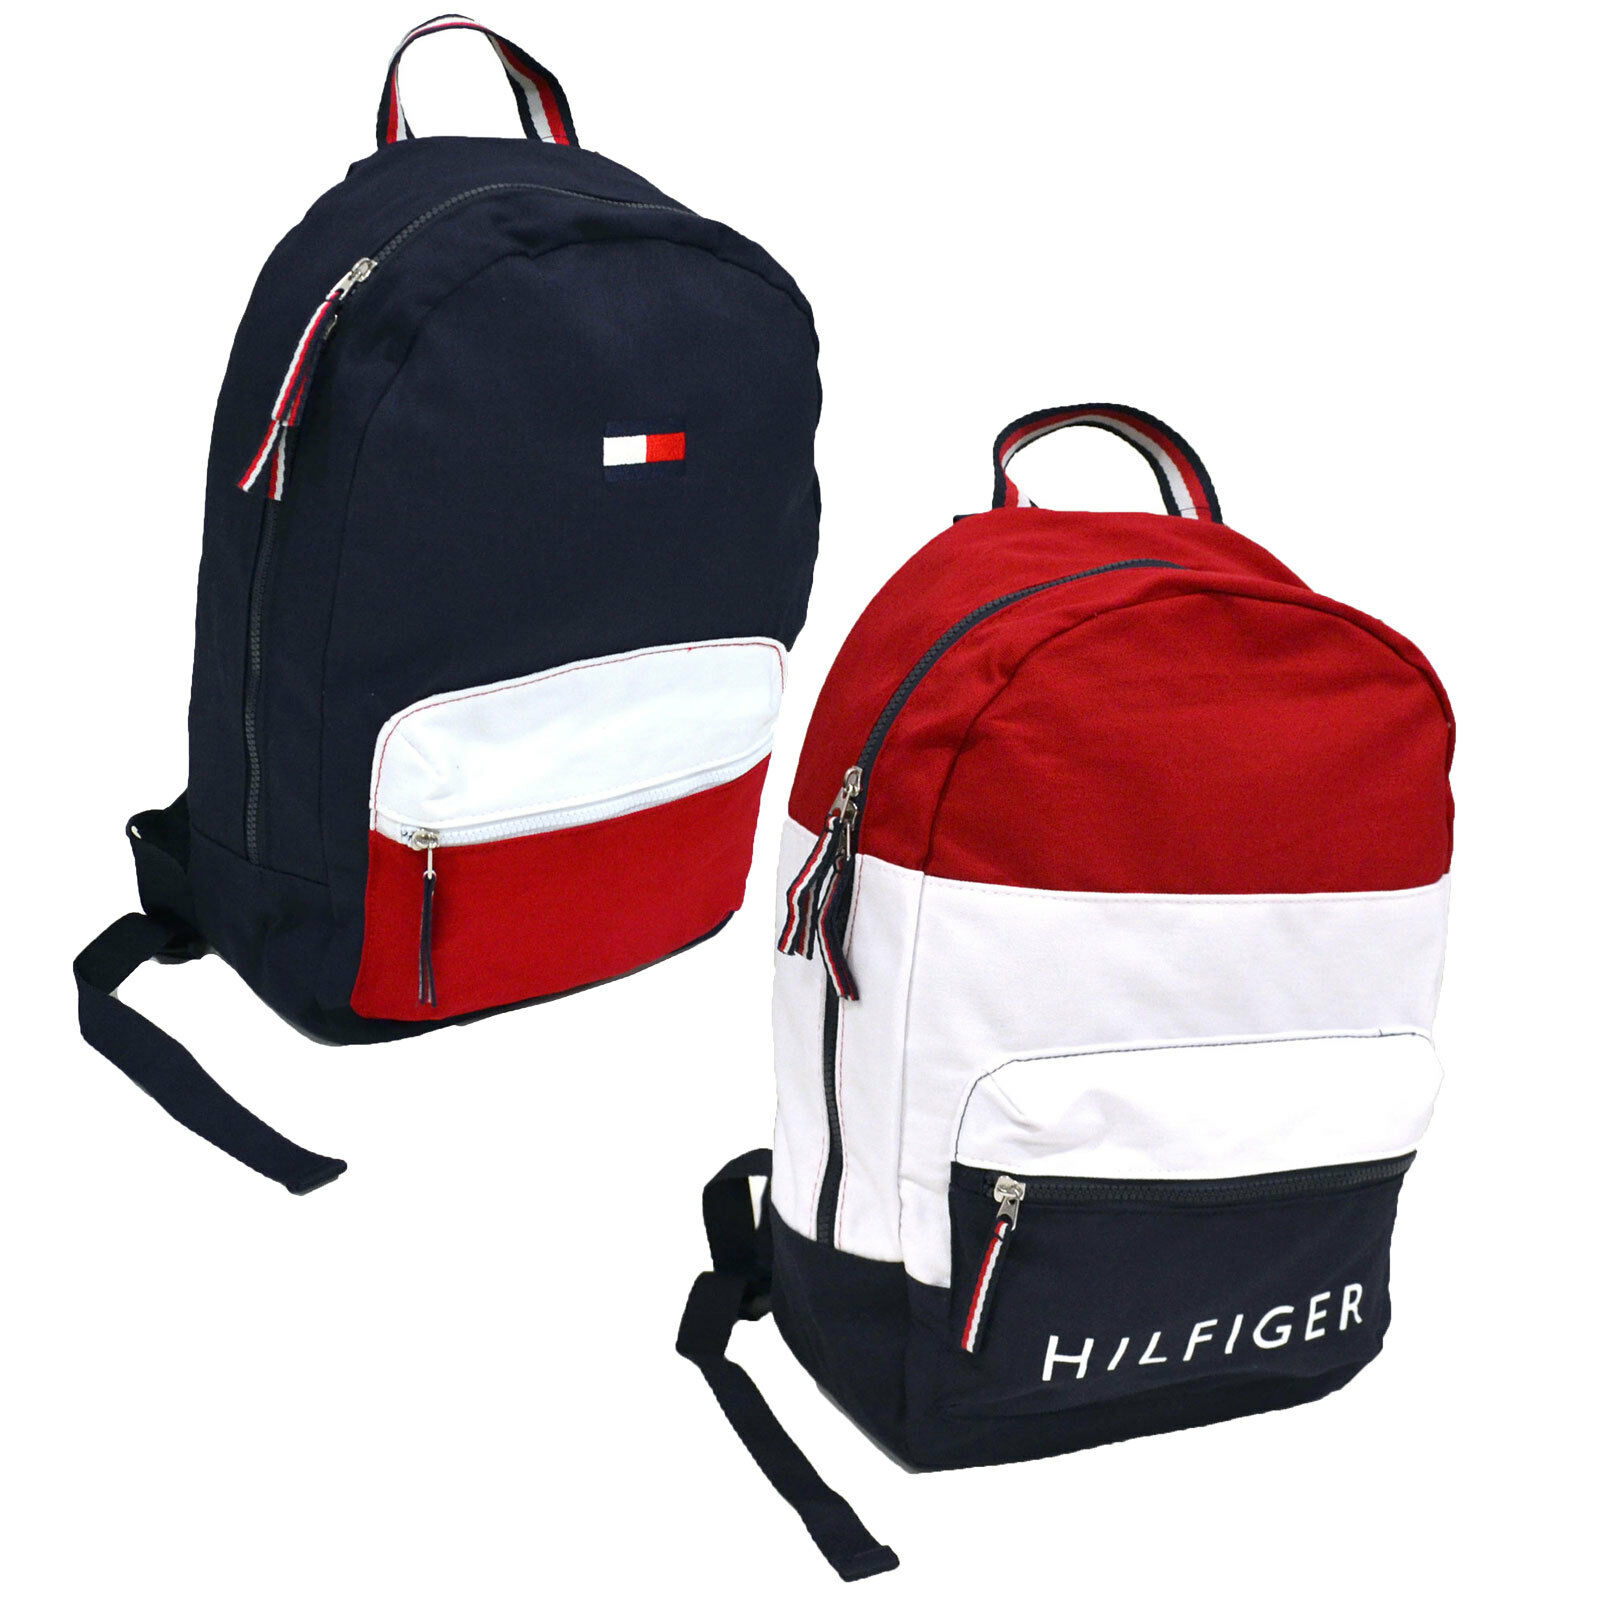 dc6da67201f5 Рюкзак, сумка или портфель для мужчины Tommy Hilfiger Backpack Canvas  Travel Book Bag 2 Pocket Mens Womens School Ne - 332570019736 - купить на  eBay.com ...